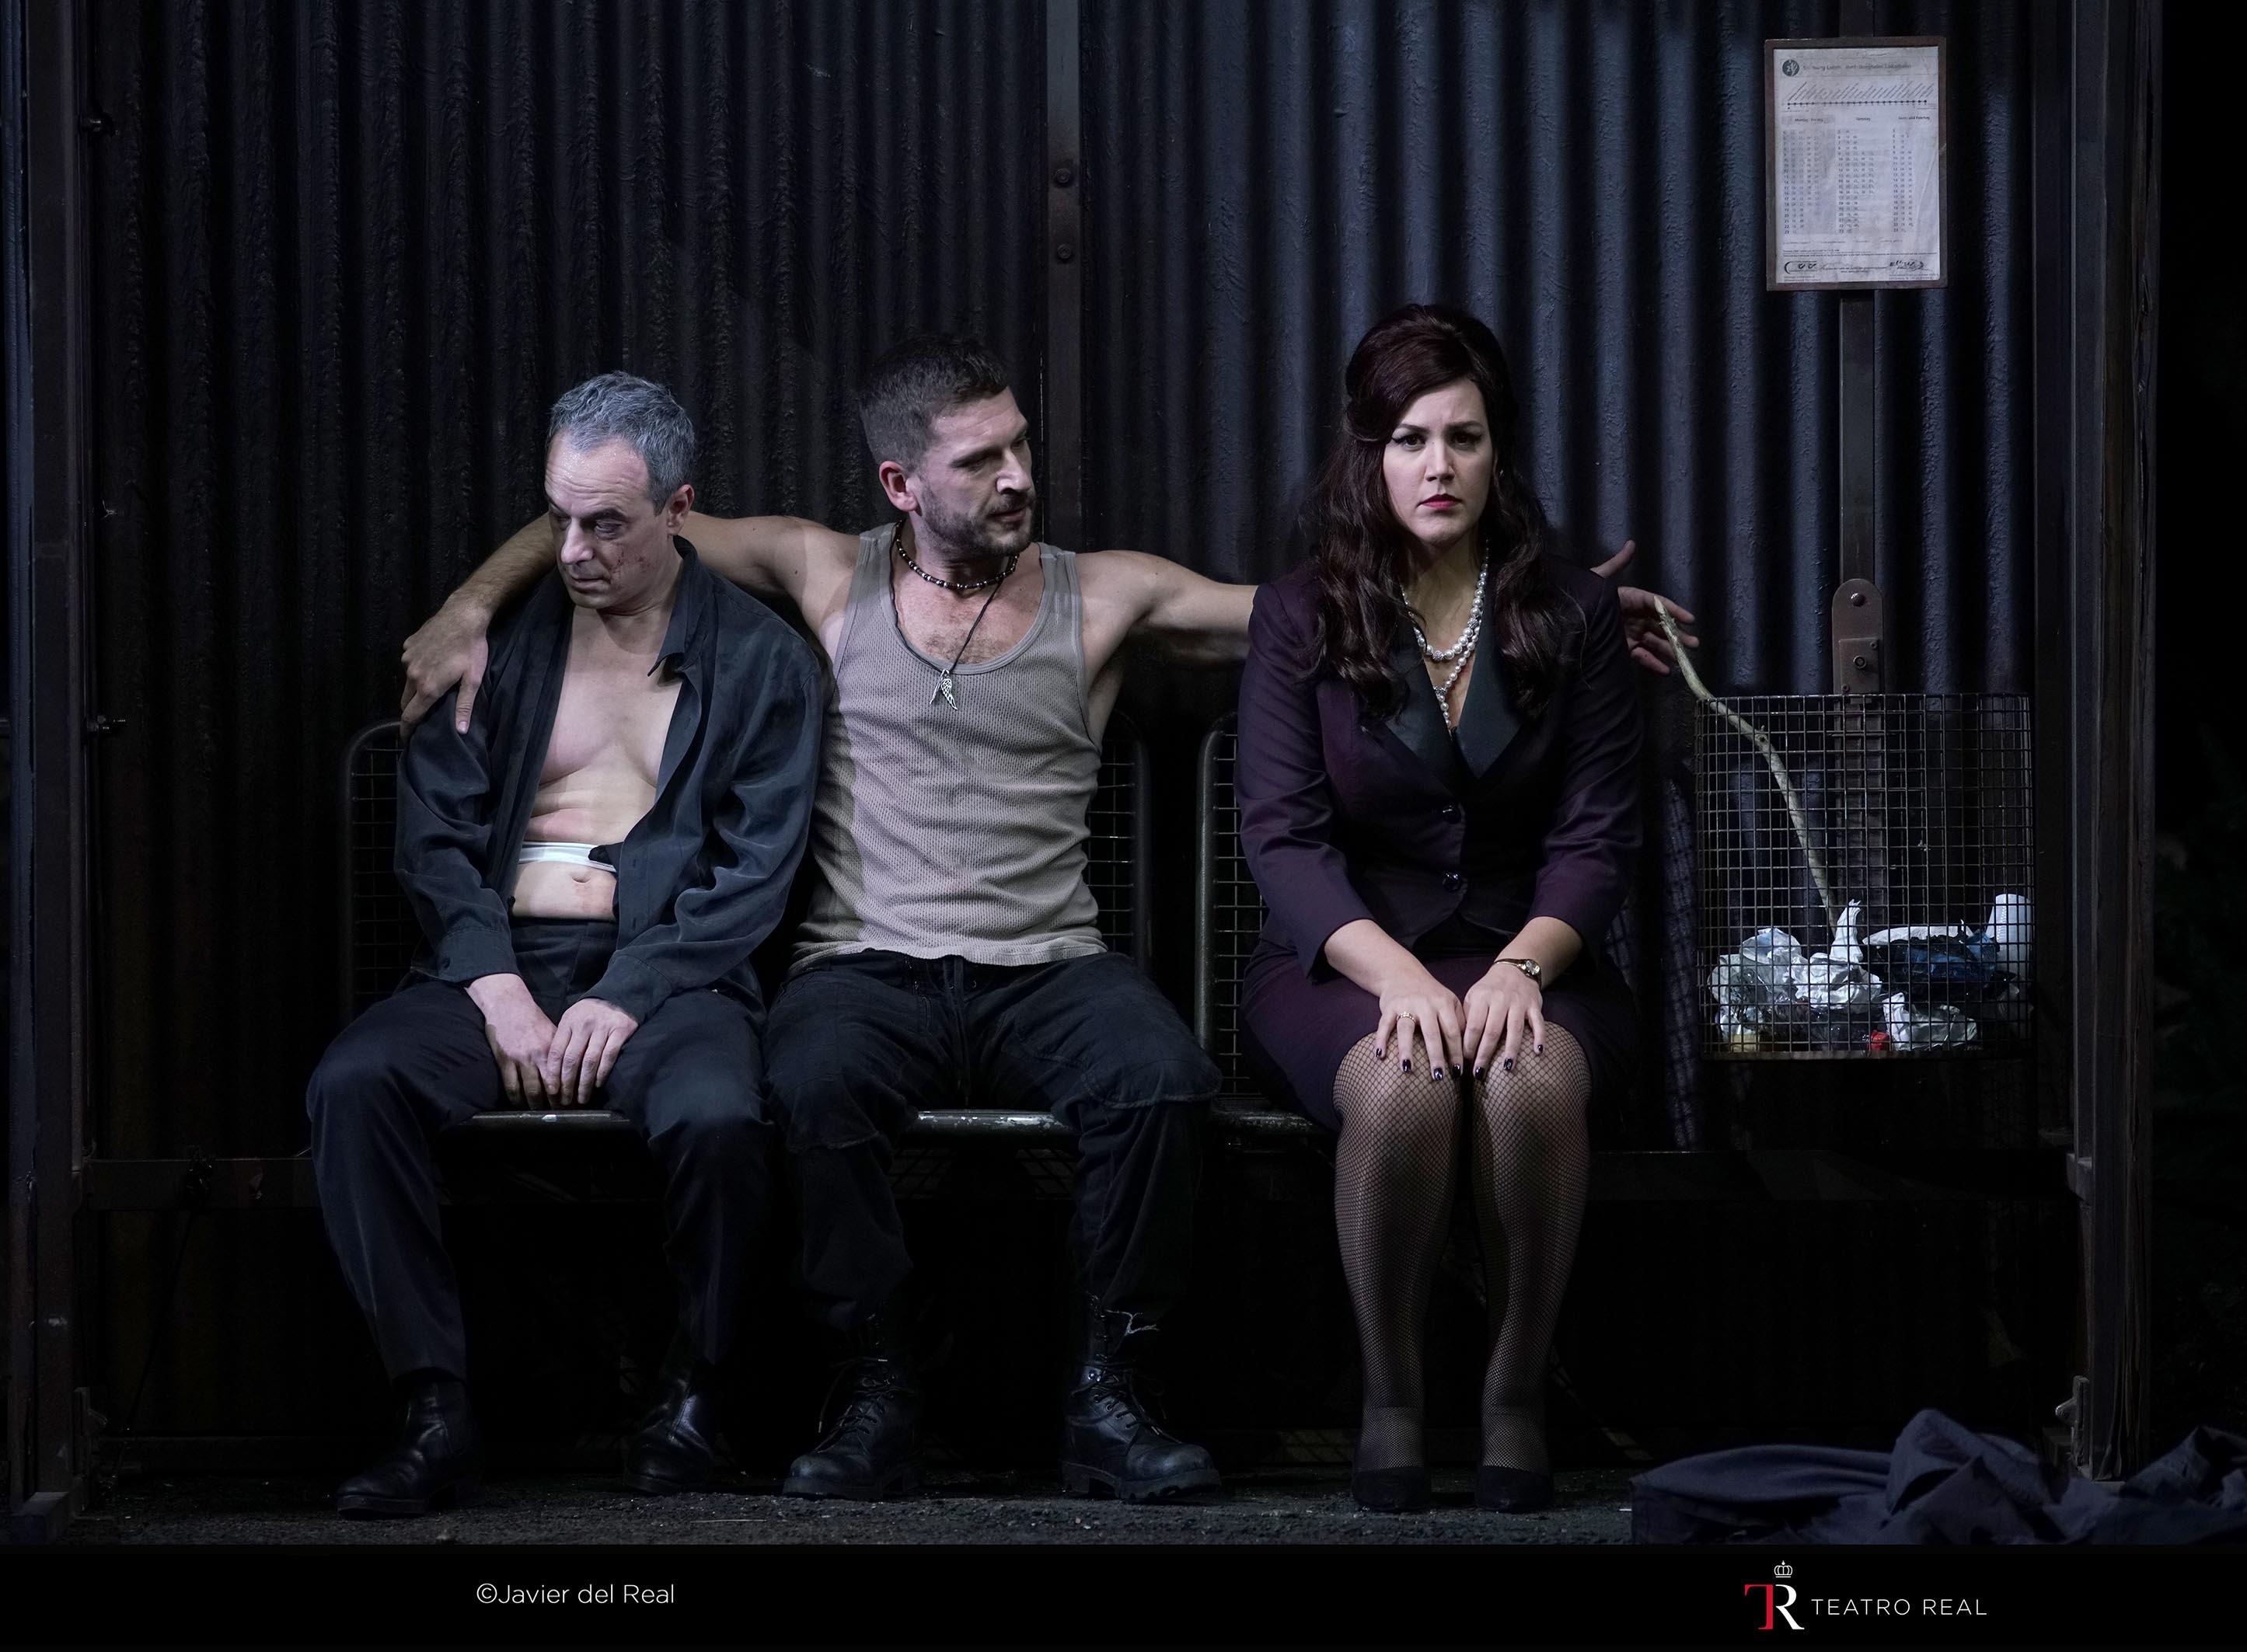 Adrian Eröd (Don Giovanni), Marko Mimica (Leporello) y Federica Lombardi (Donna Elvira) esperando el bus